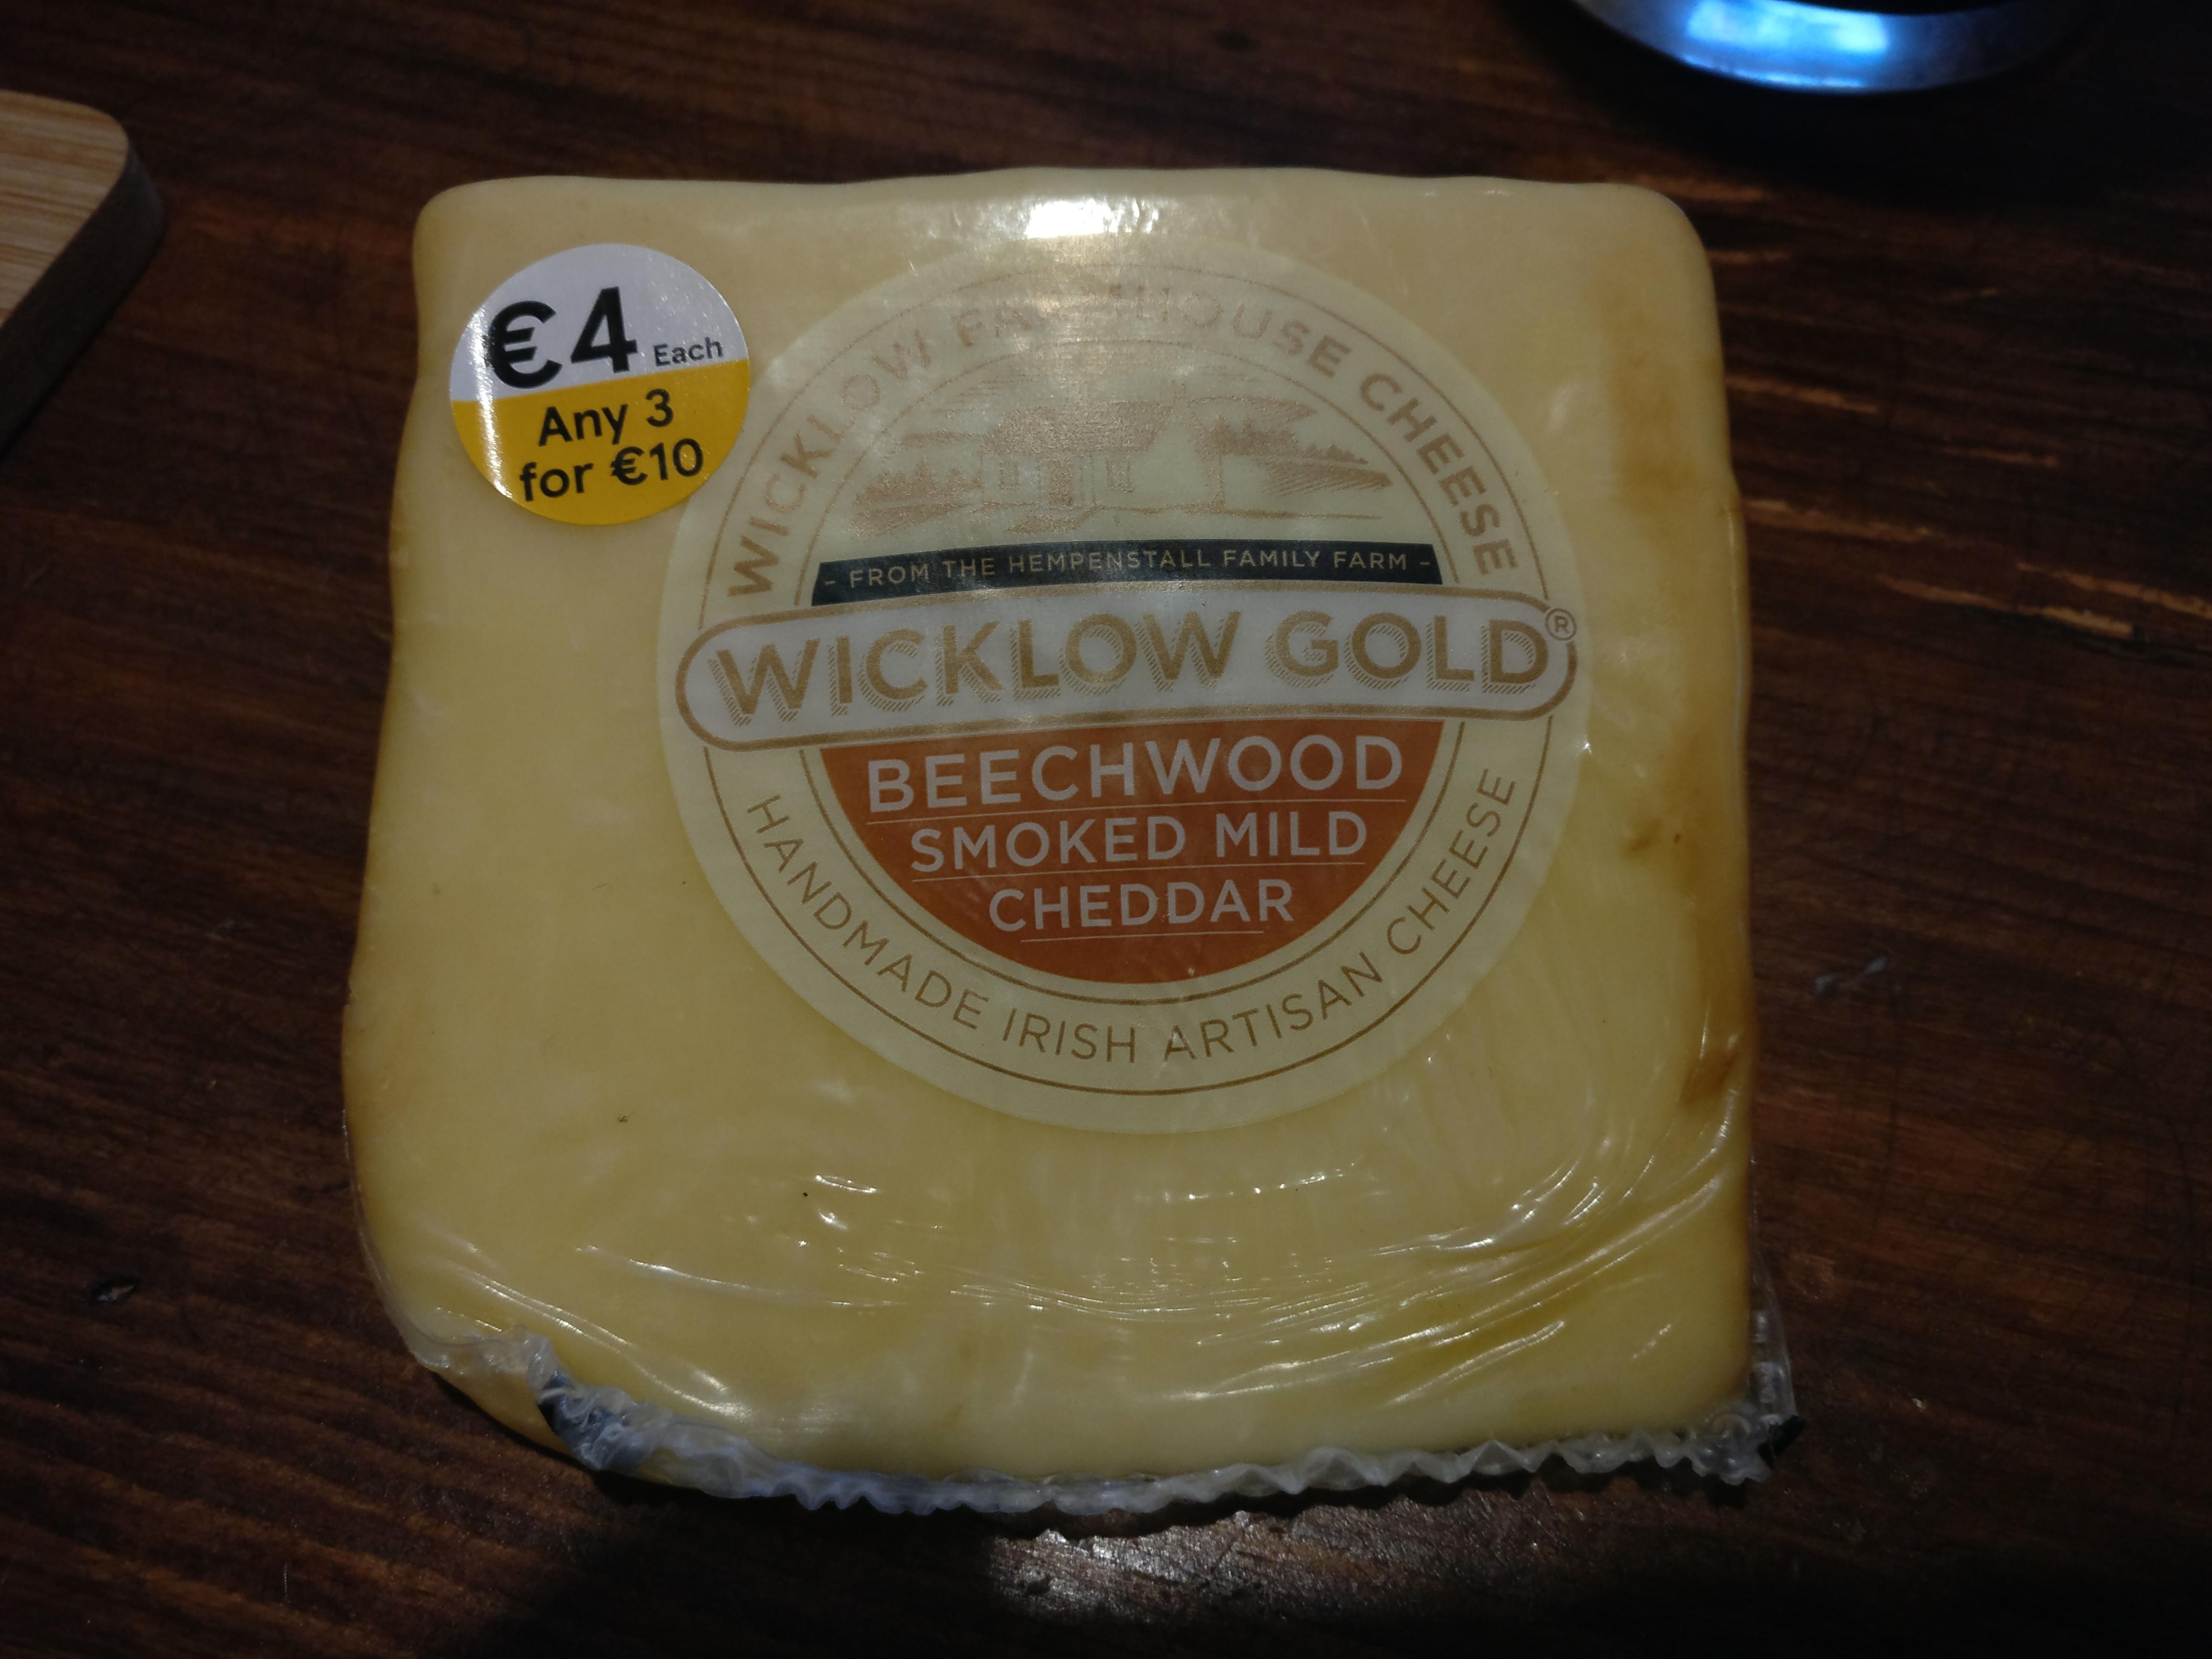 Wicklow Gold - Beechwood Smoked